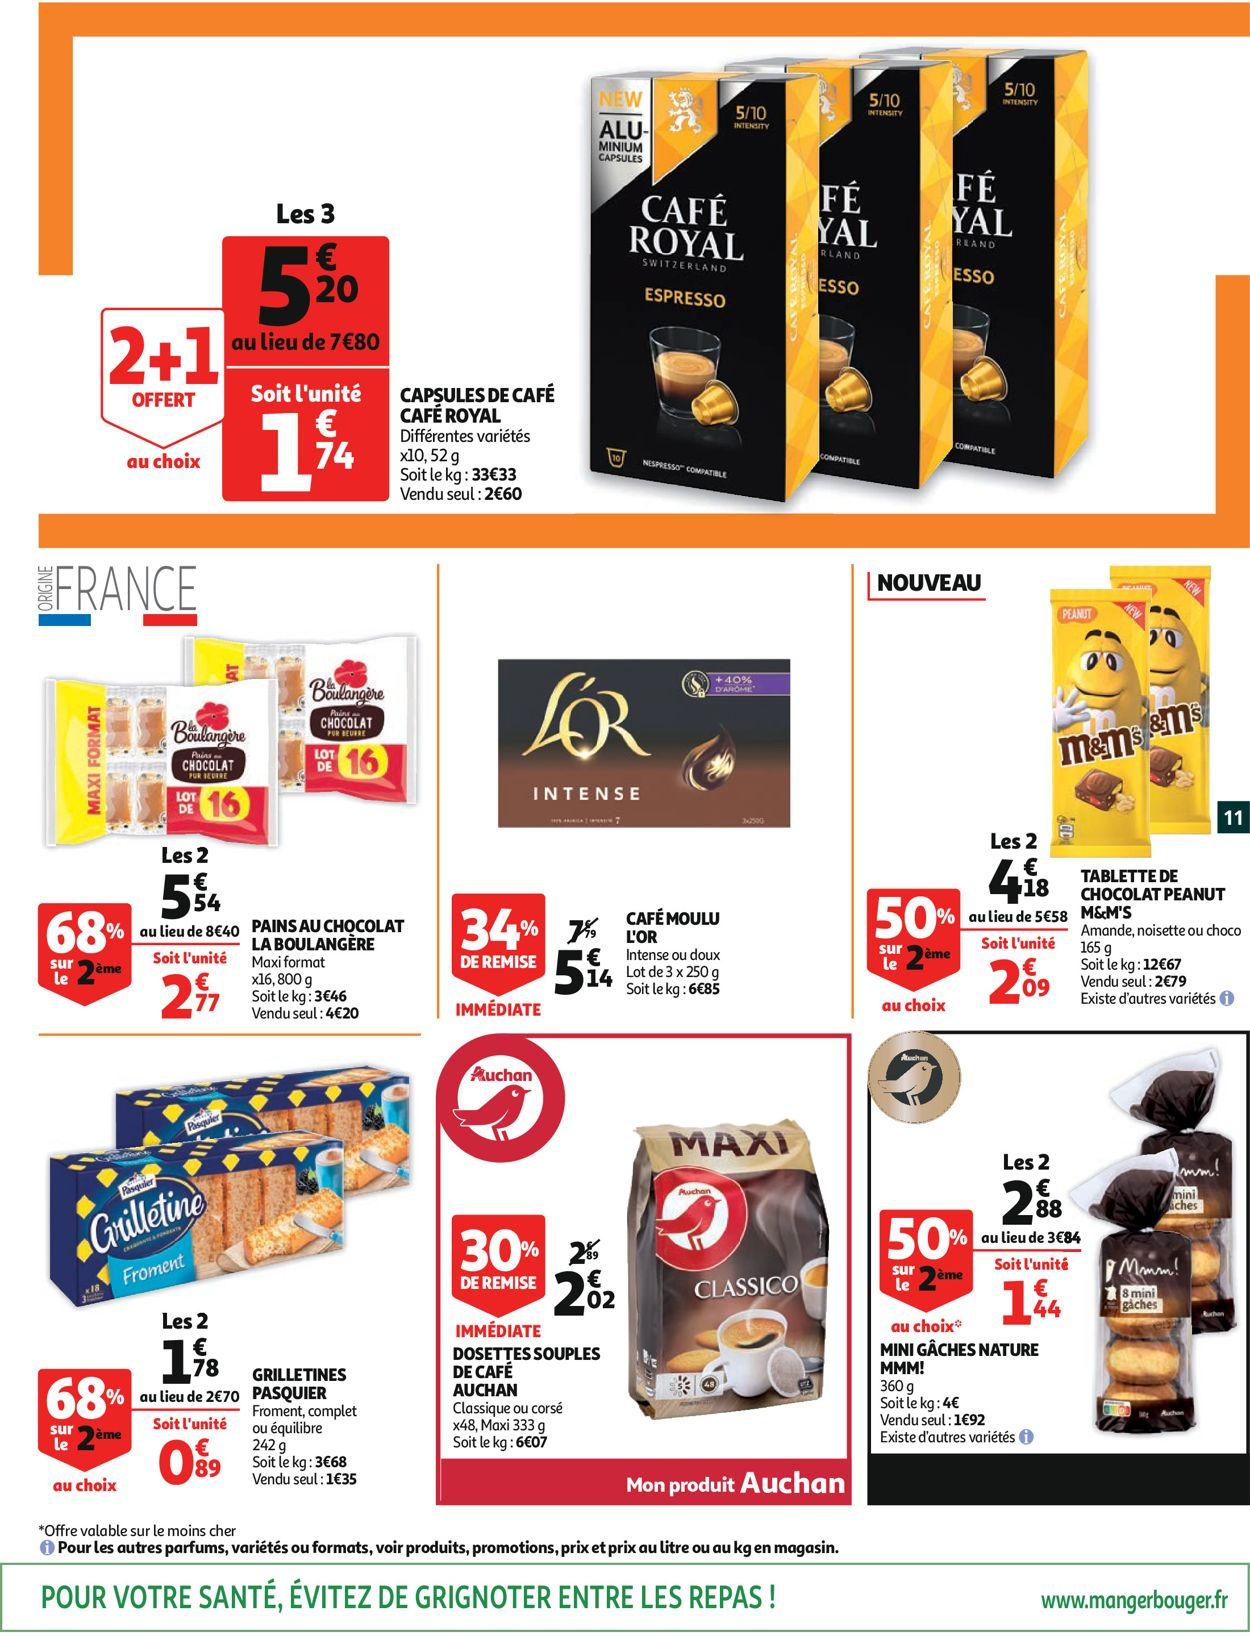 Auchan Catalogue - 02.09-08.09.2020 (Page 11)